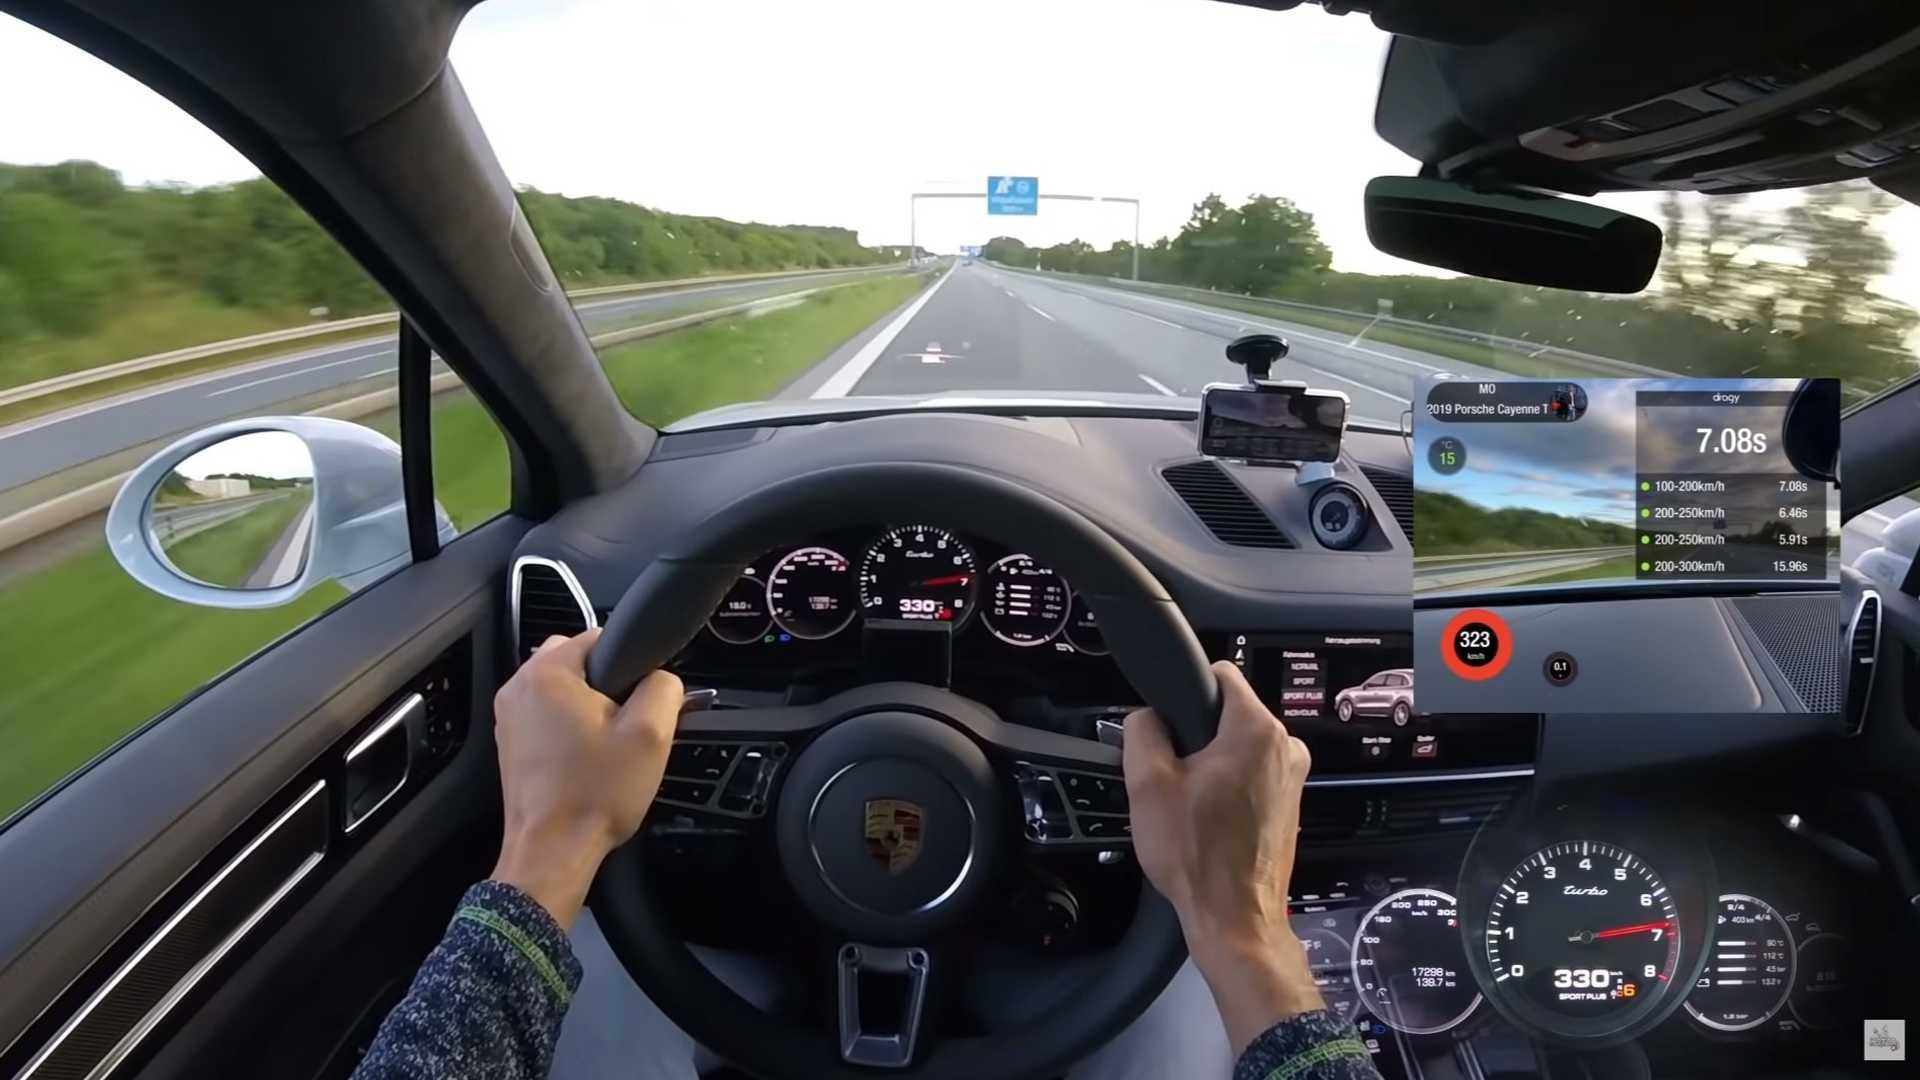 Porsche Cayenne Turbo HGP Turbo